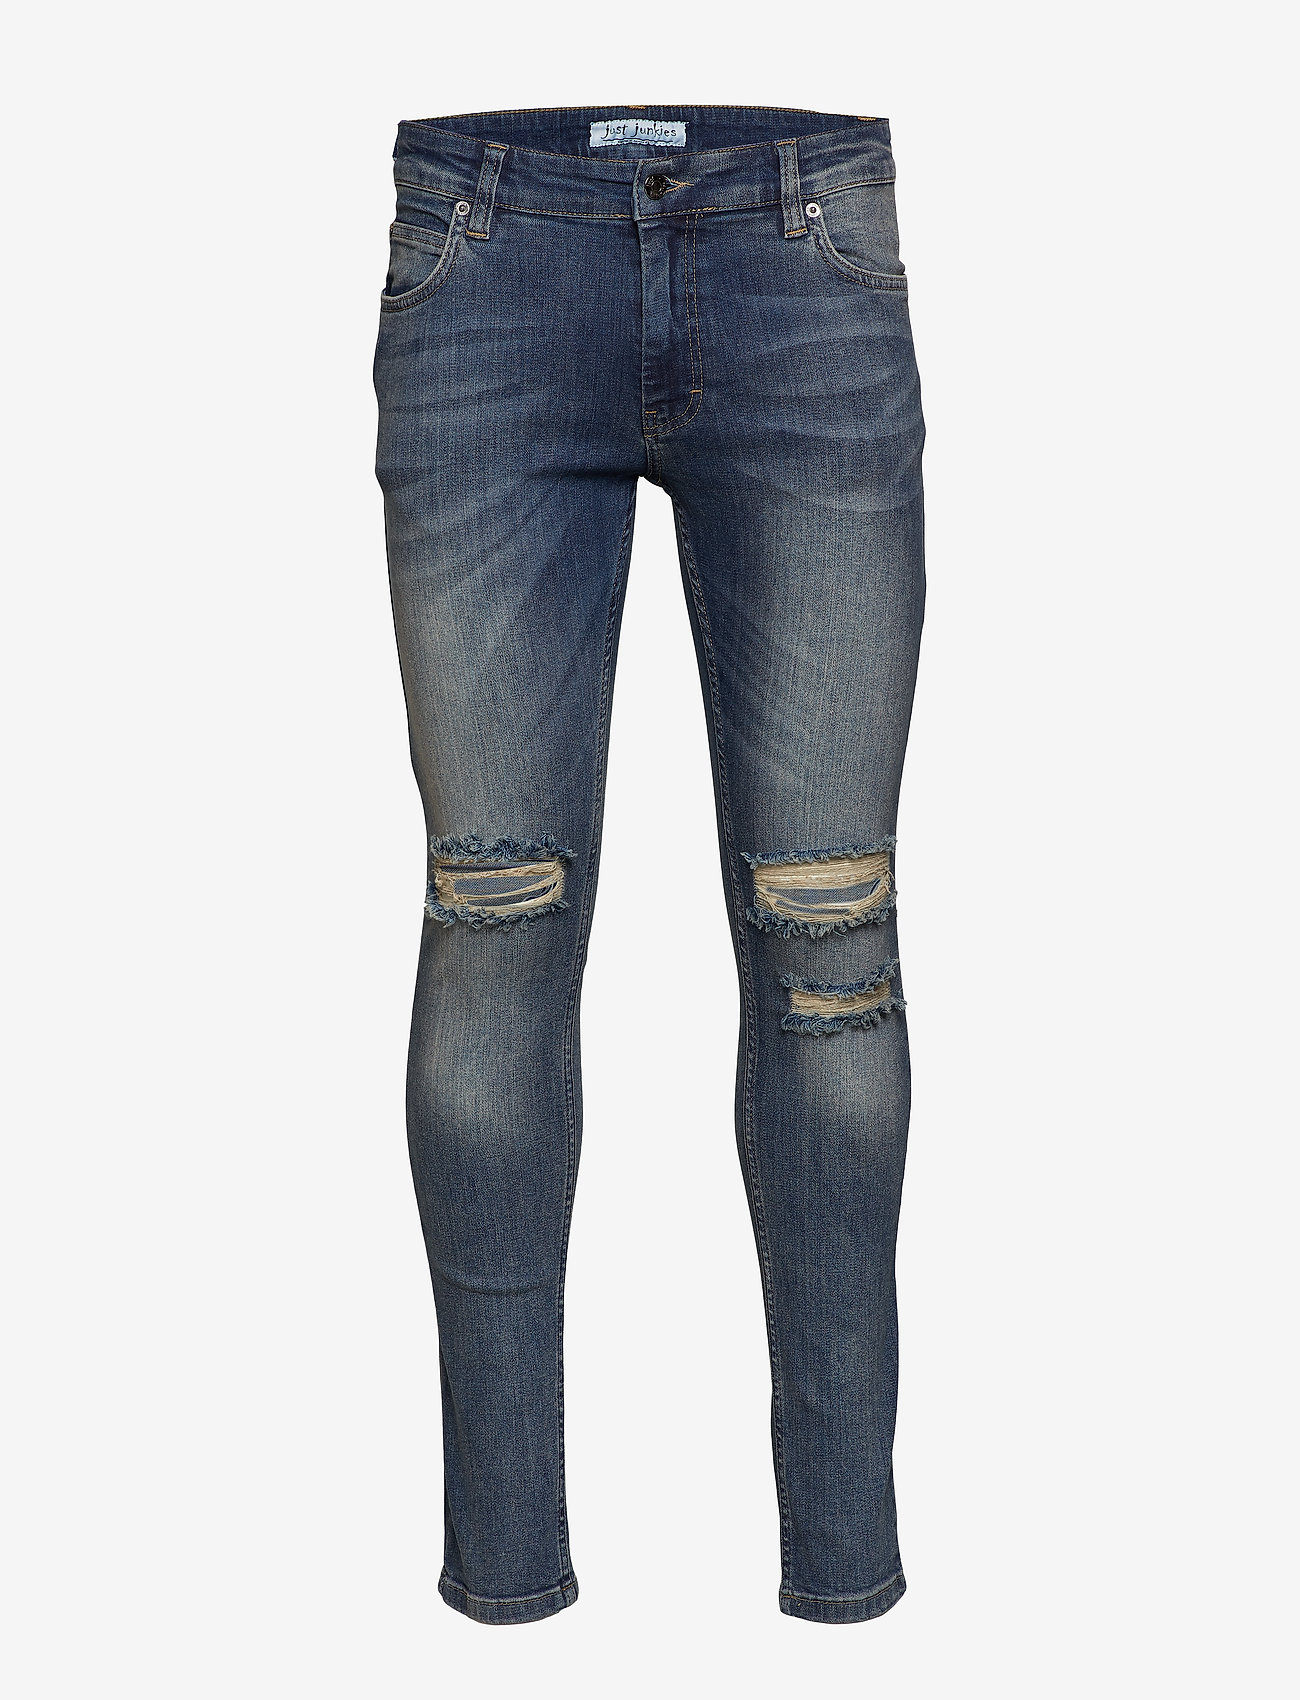 Just Junkies - Max Of-652 - skinny jeans - of